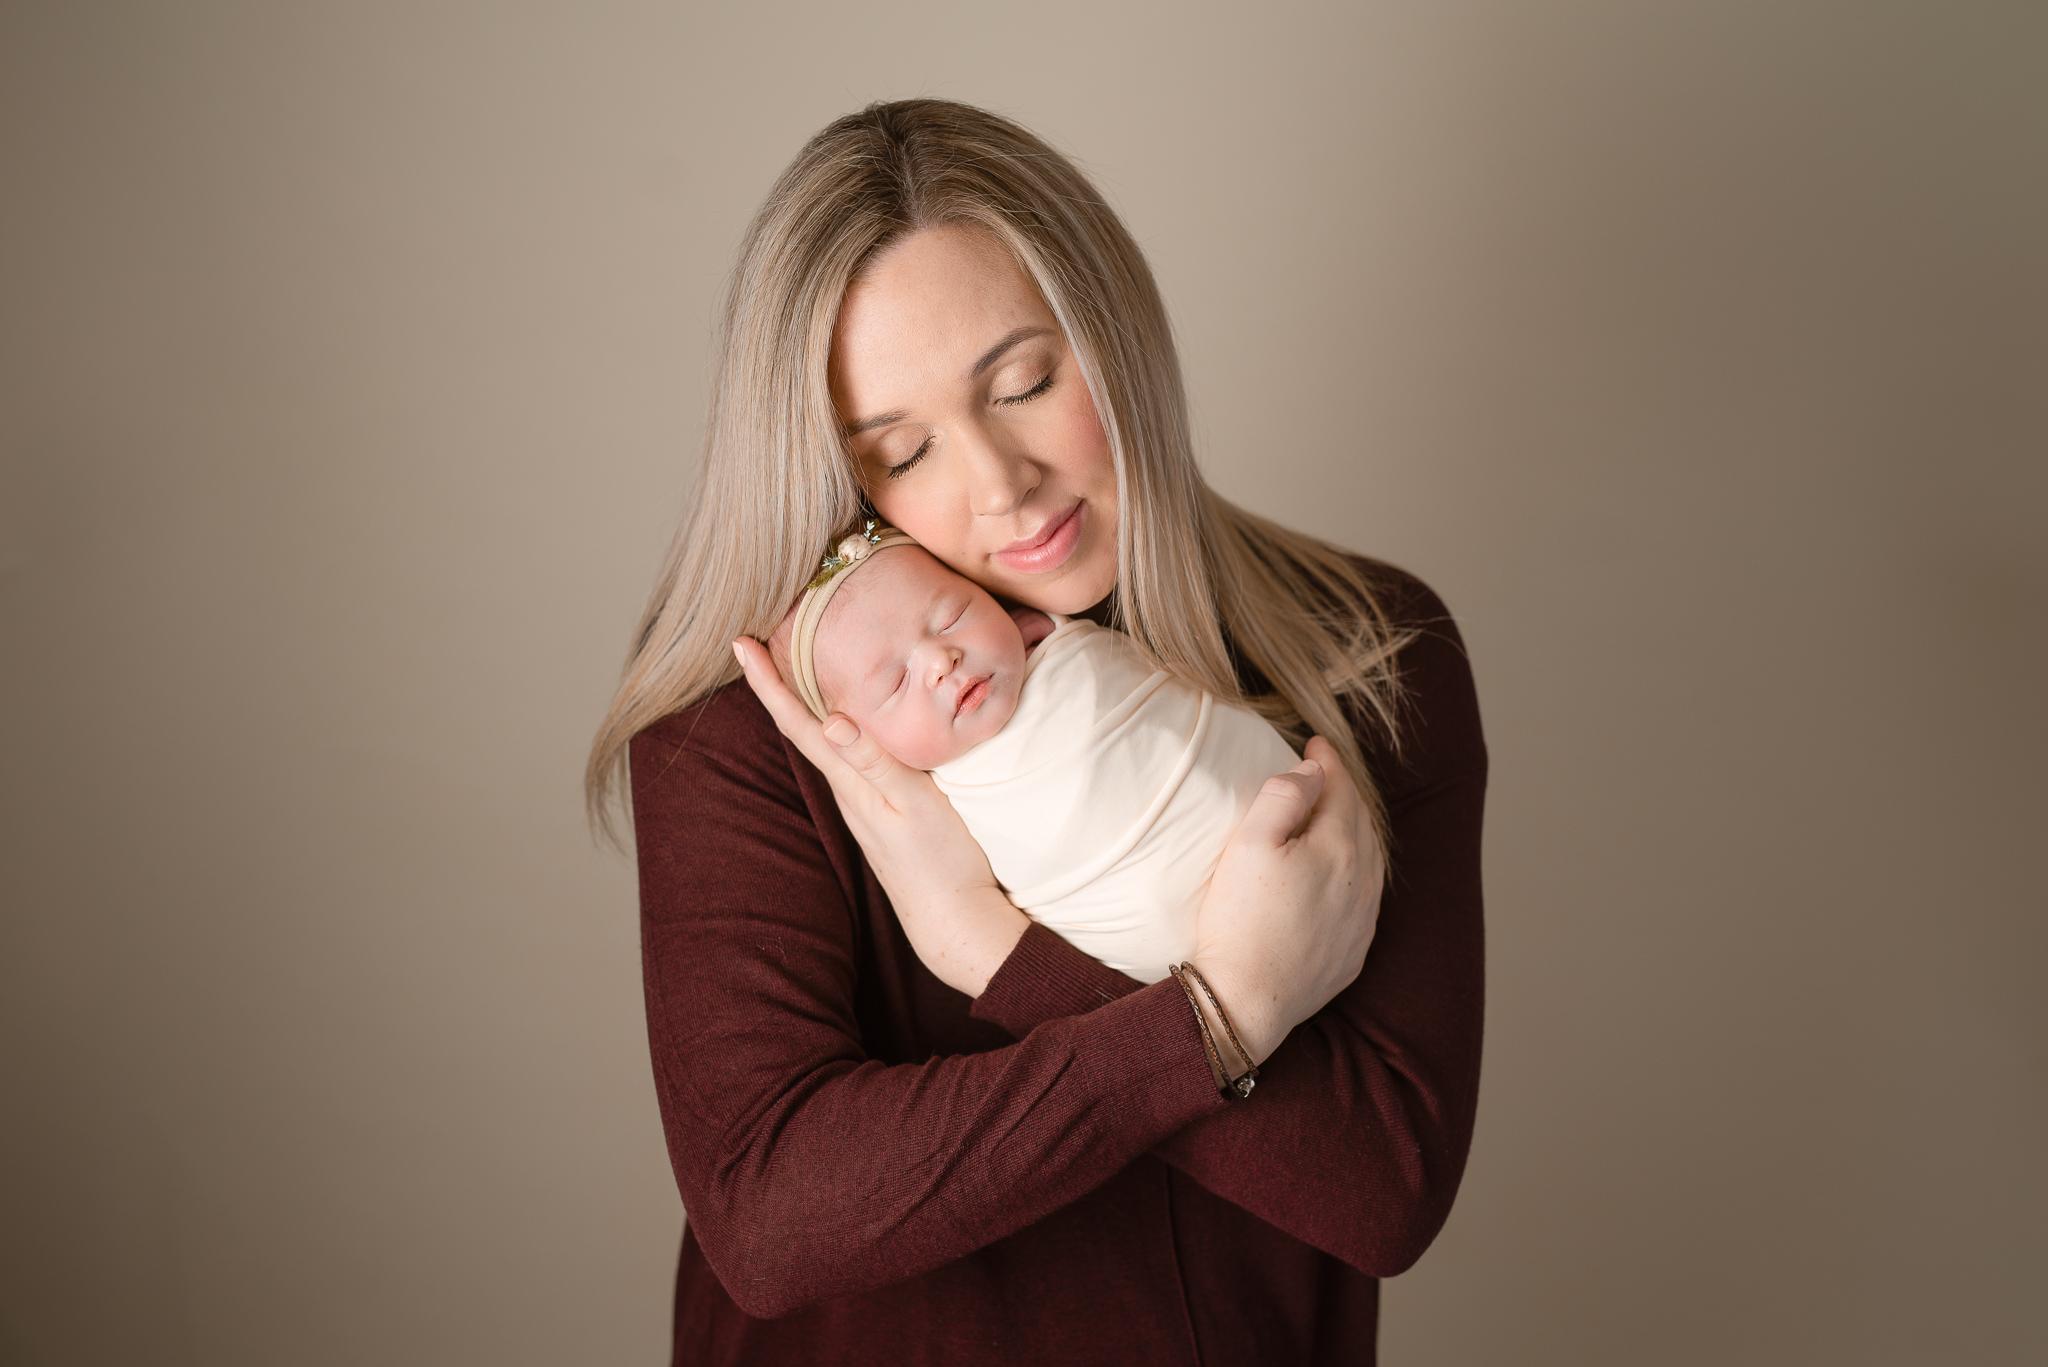 Newborn178NaomiLuciennePhotography032019-Edit.jpg